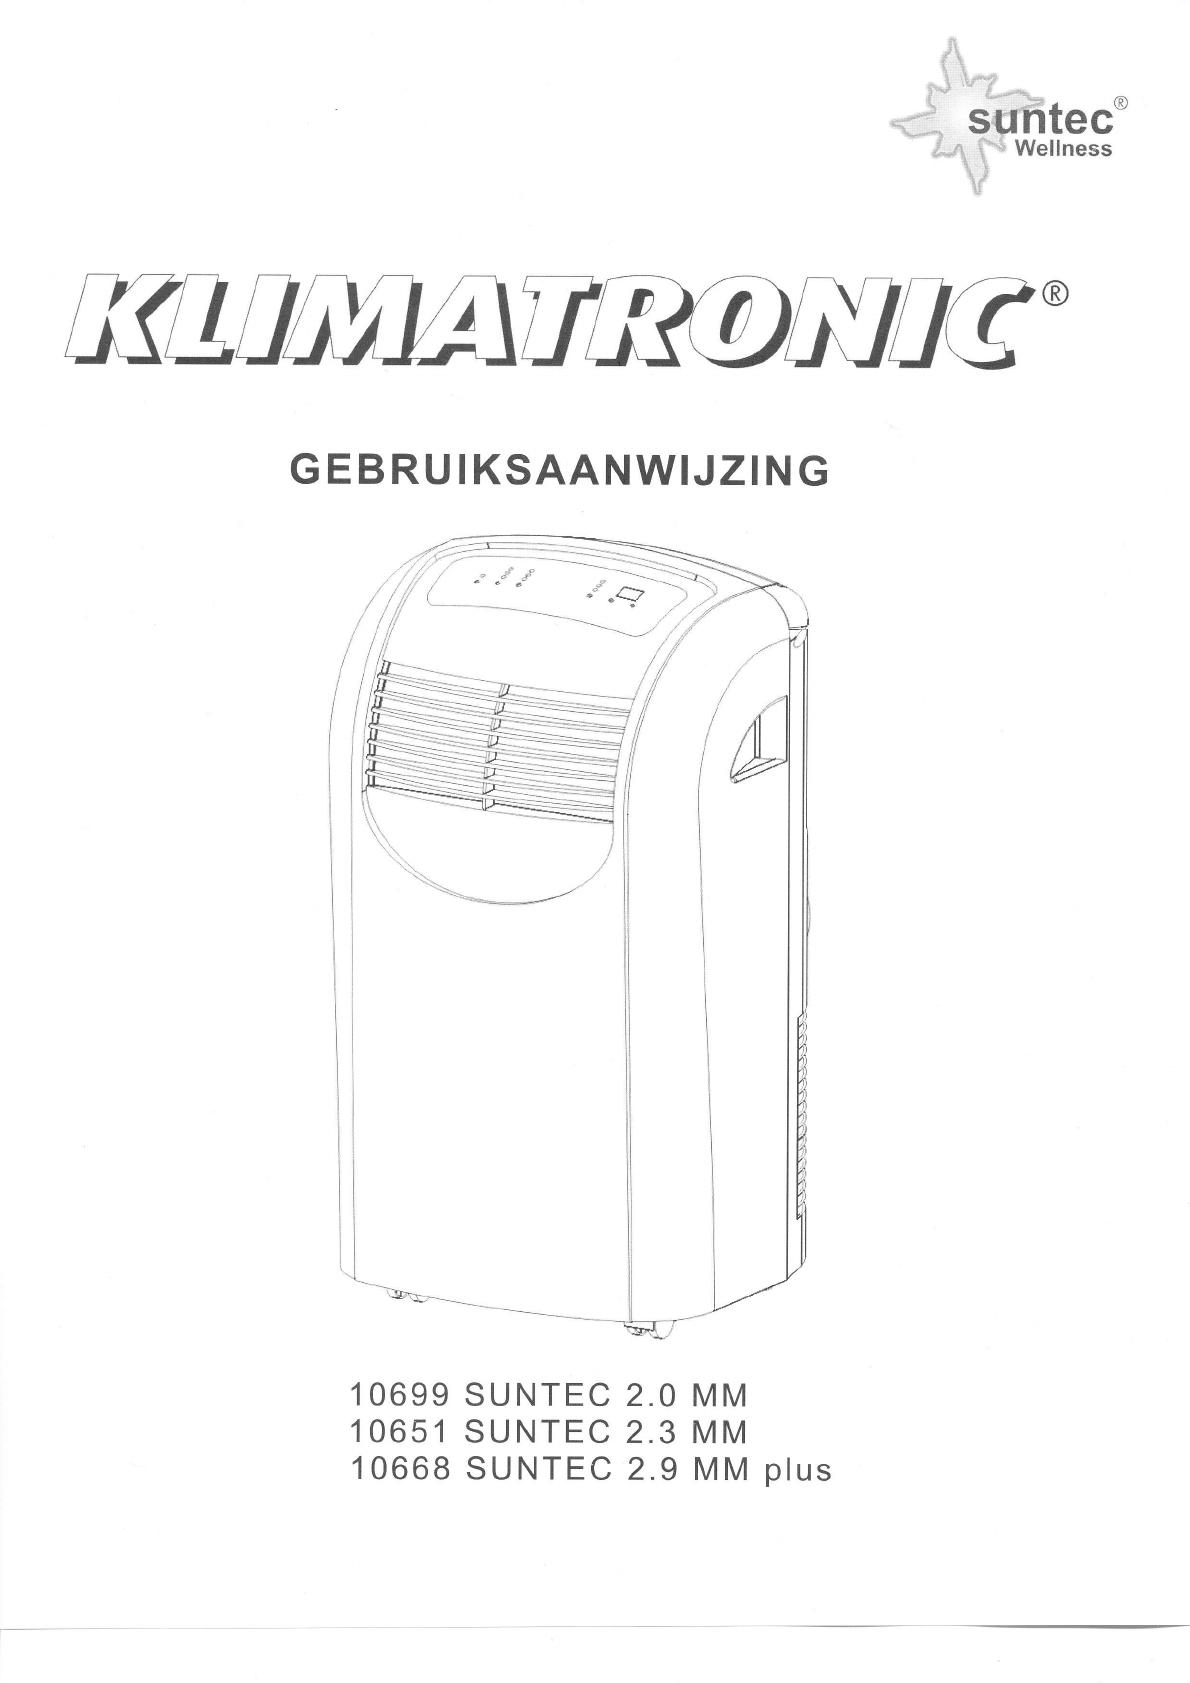 Be Nungsanleitung Suntec Suntech 2 3 Mm Seite 1 Von 10 Hollandisch